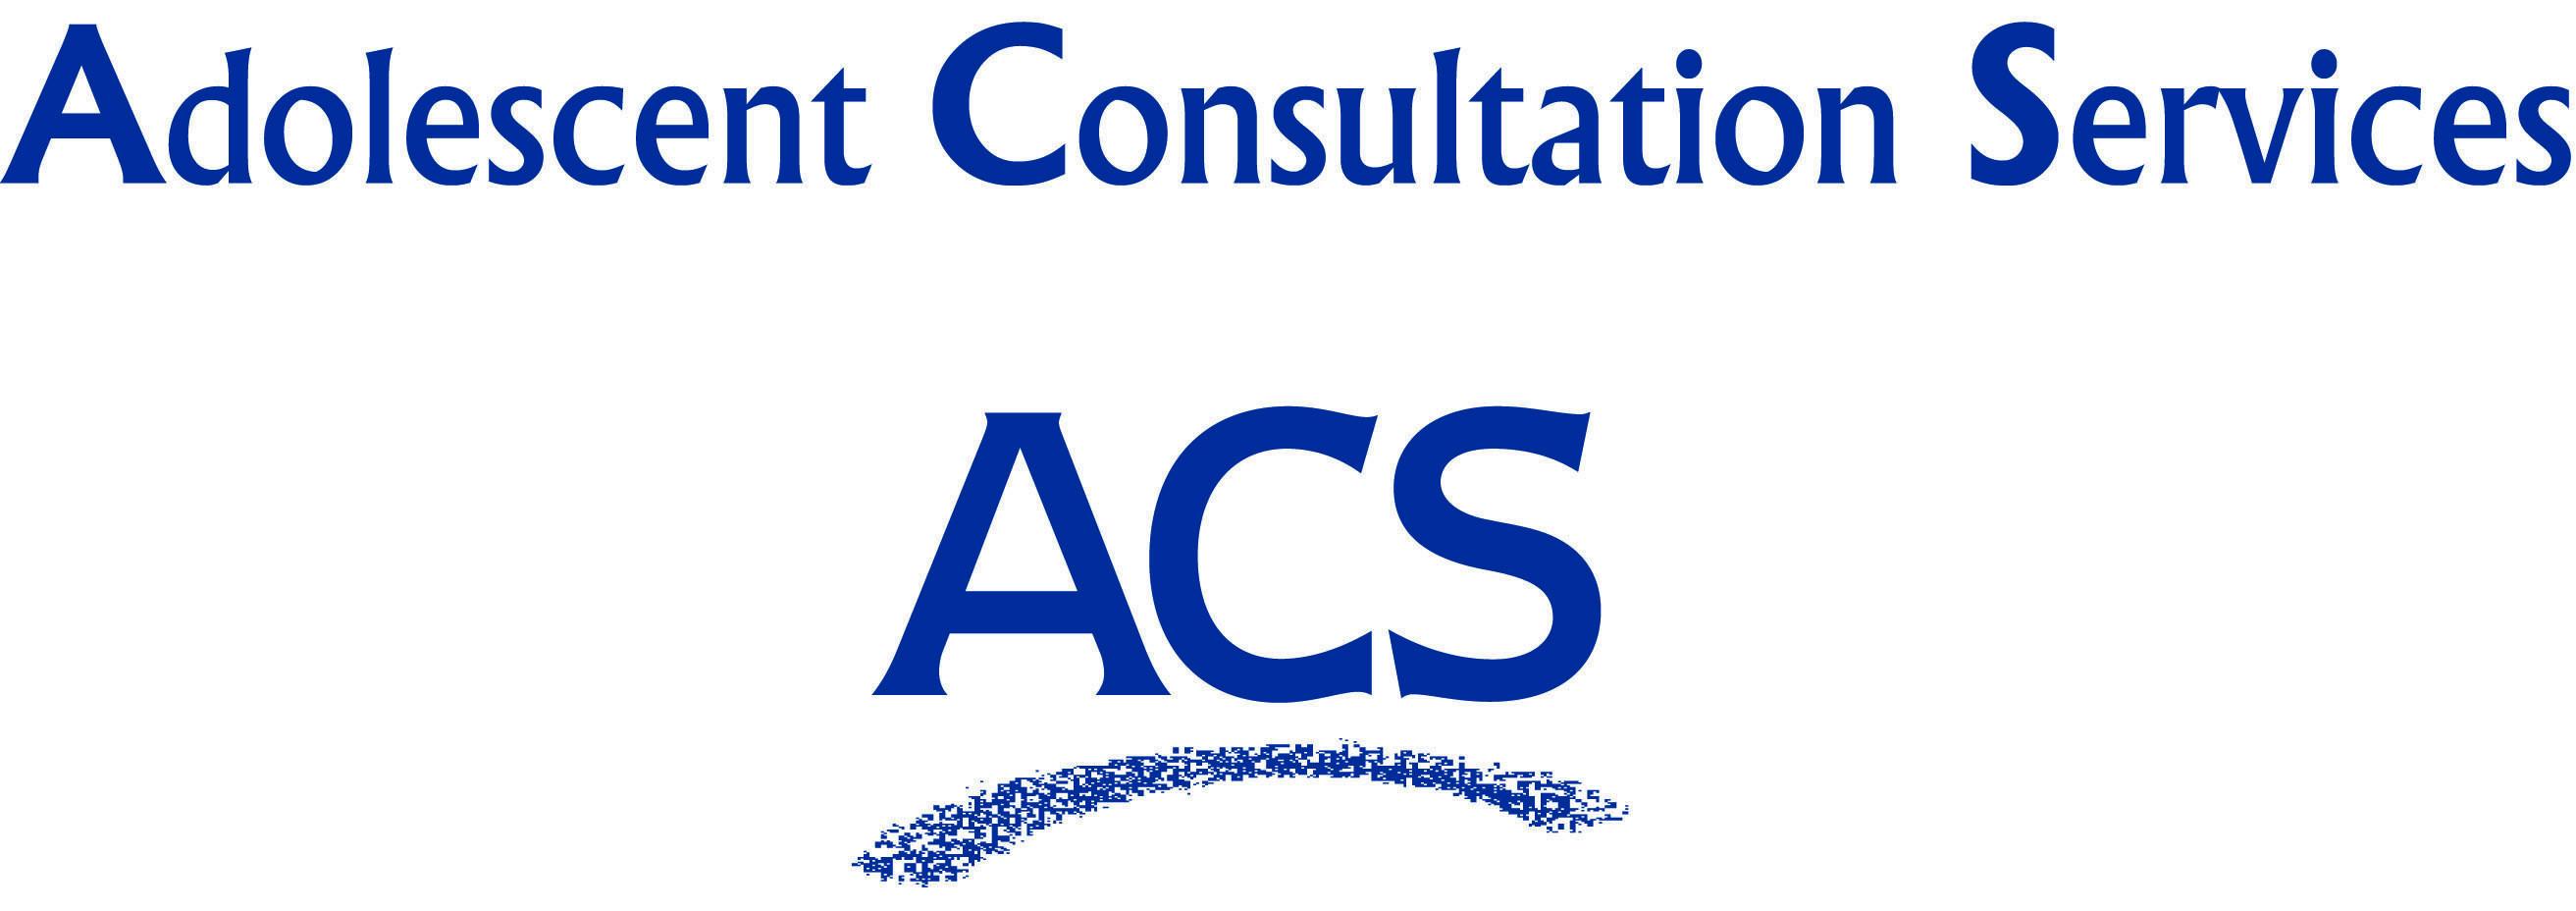 Adolescent Consultation Services